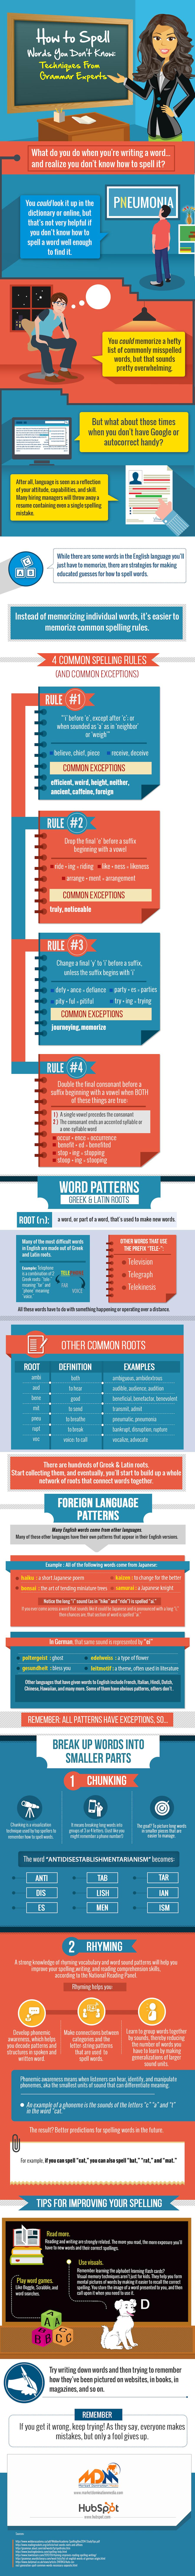 professional infographic design distribution infographics